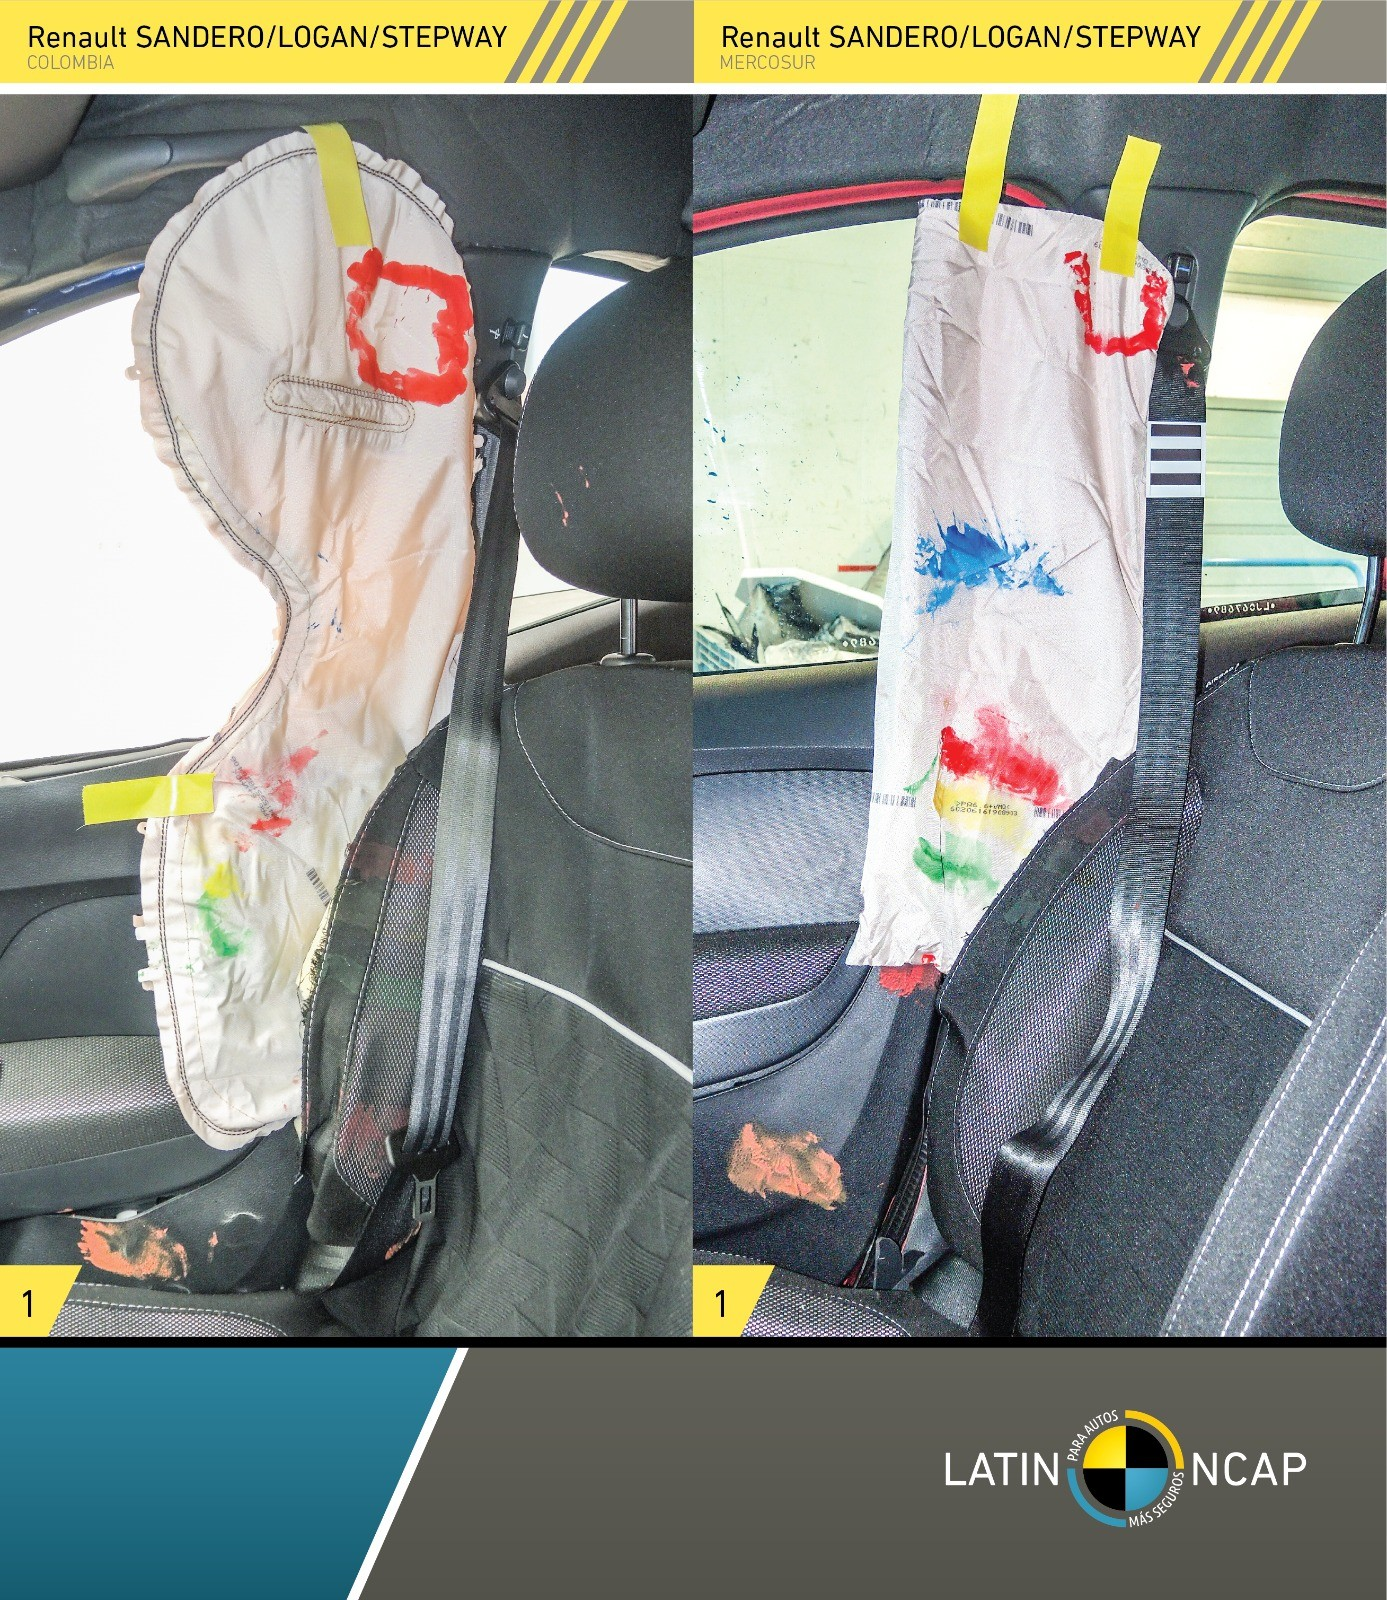 Краш-тест Renault Logan - Краш-тест ЛОГАНА, или Бедность — не порок! - LOGAN - КРАШ-ТЕСТЫ - Тест-драйвы и Краш-тесты - Renault atlas / Рено атлас